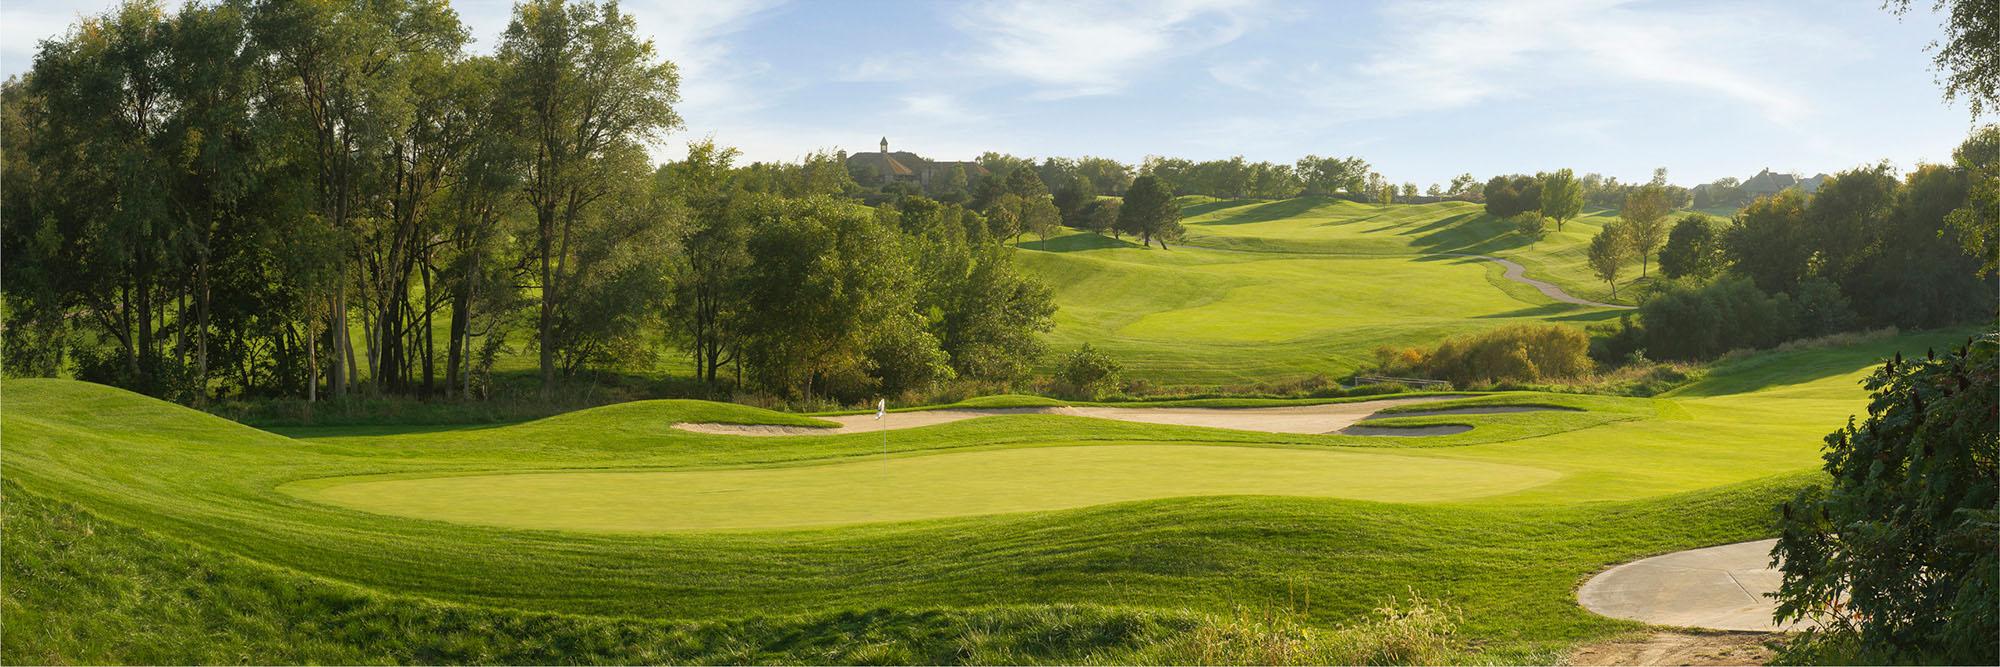 Golf Course Image - Champions Run No. 10